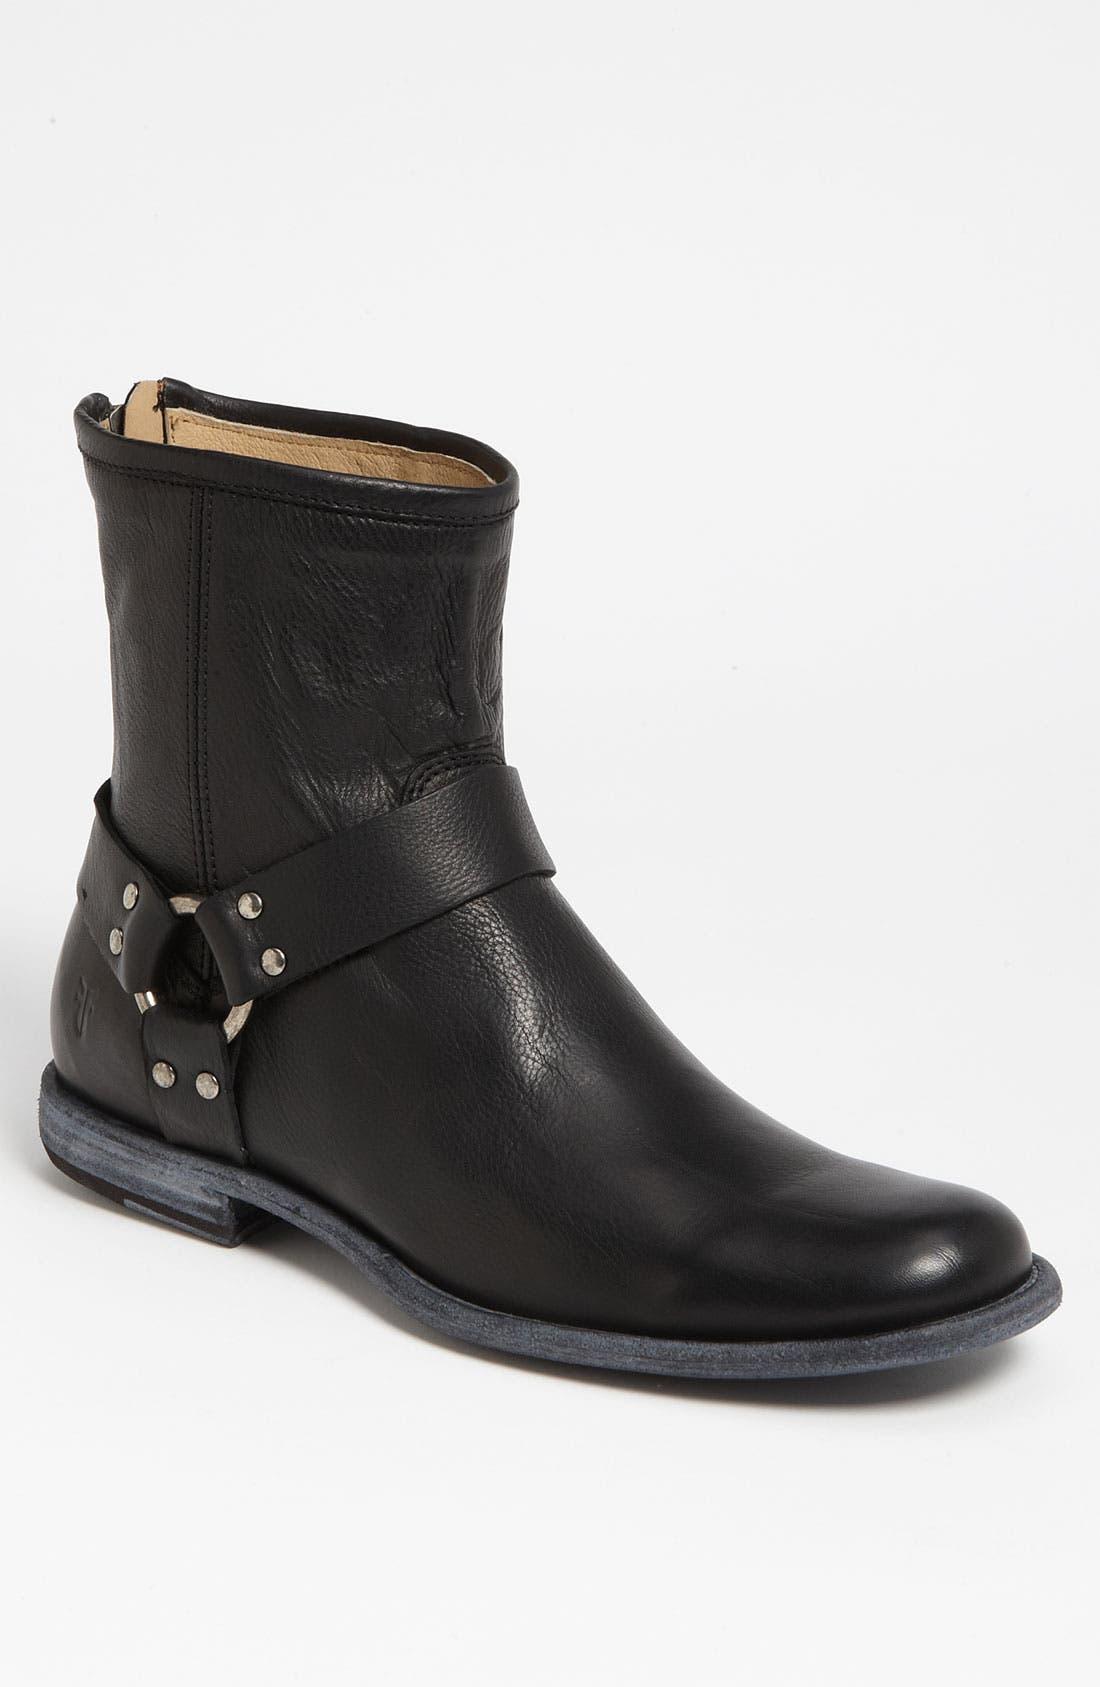 Alternate Image 1 Selected - Frye 'Phillip' Harness Boot (Men)